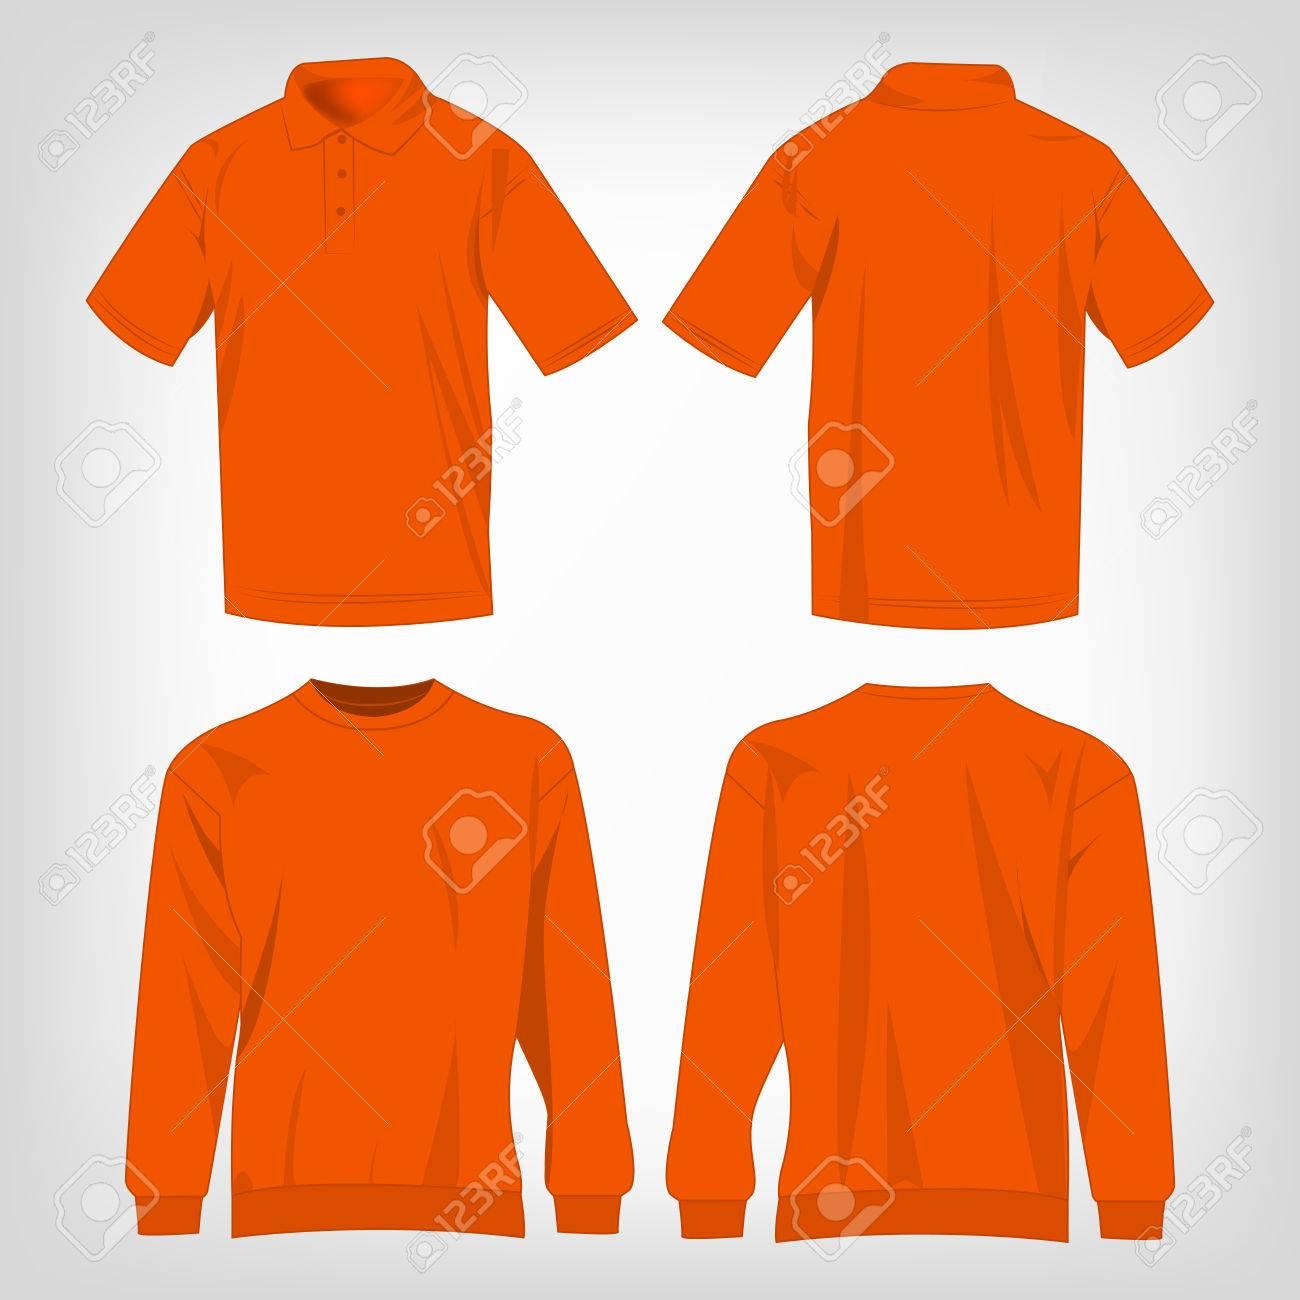 Oranje Trui.Sport Oranje Trui En Polo Shirt Geisoleerde Set Vector Royalty Vrije